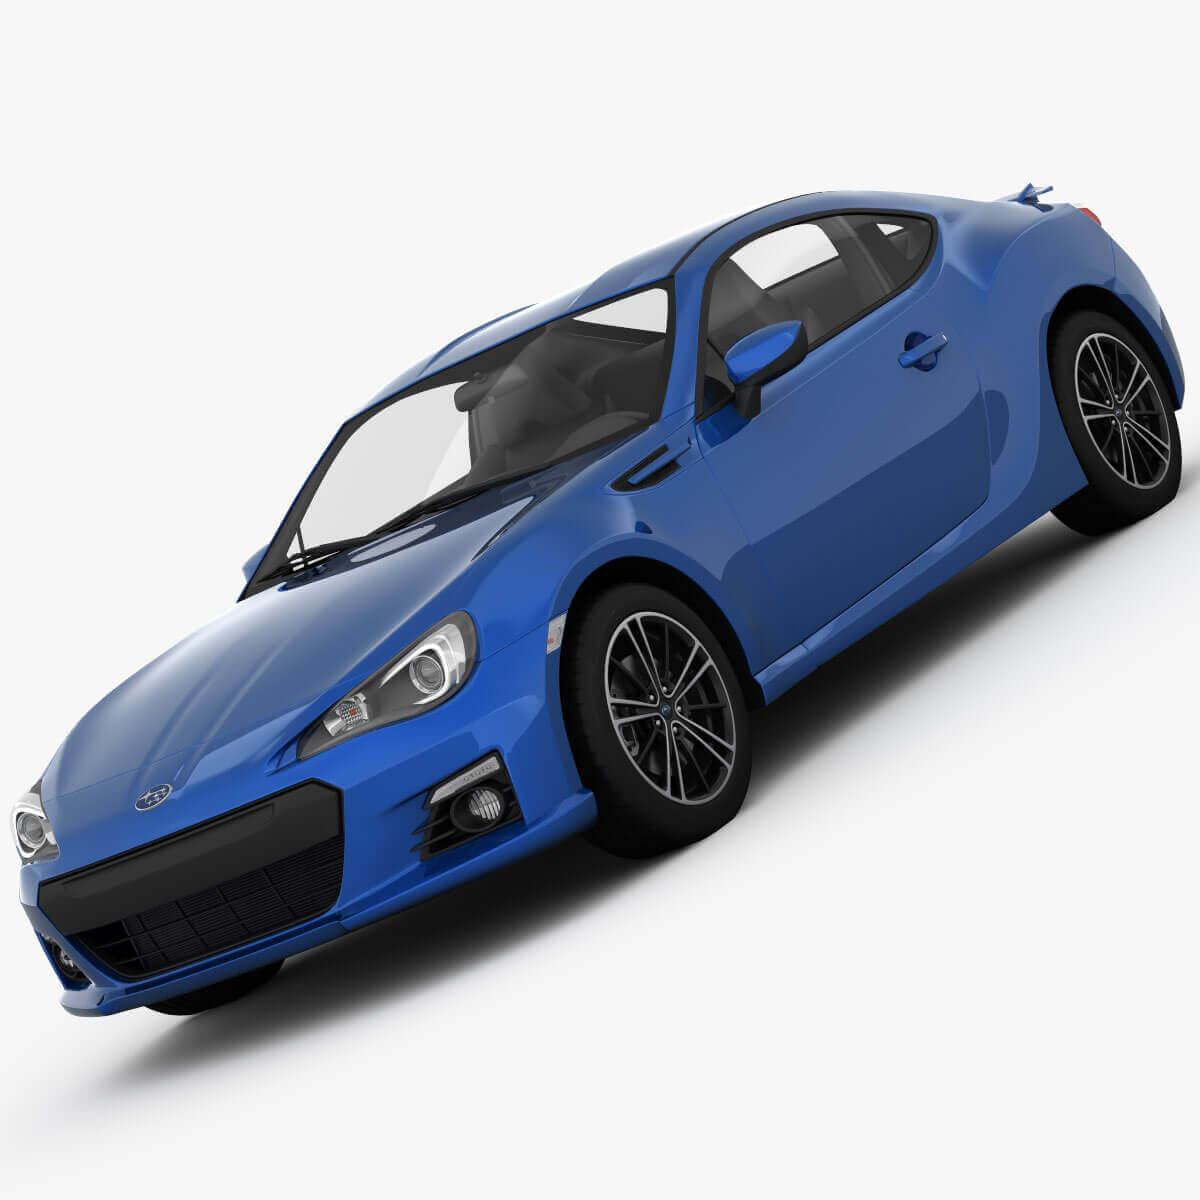 2013 Subaru BRZ 3D Model